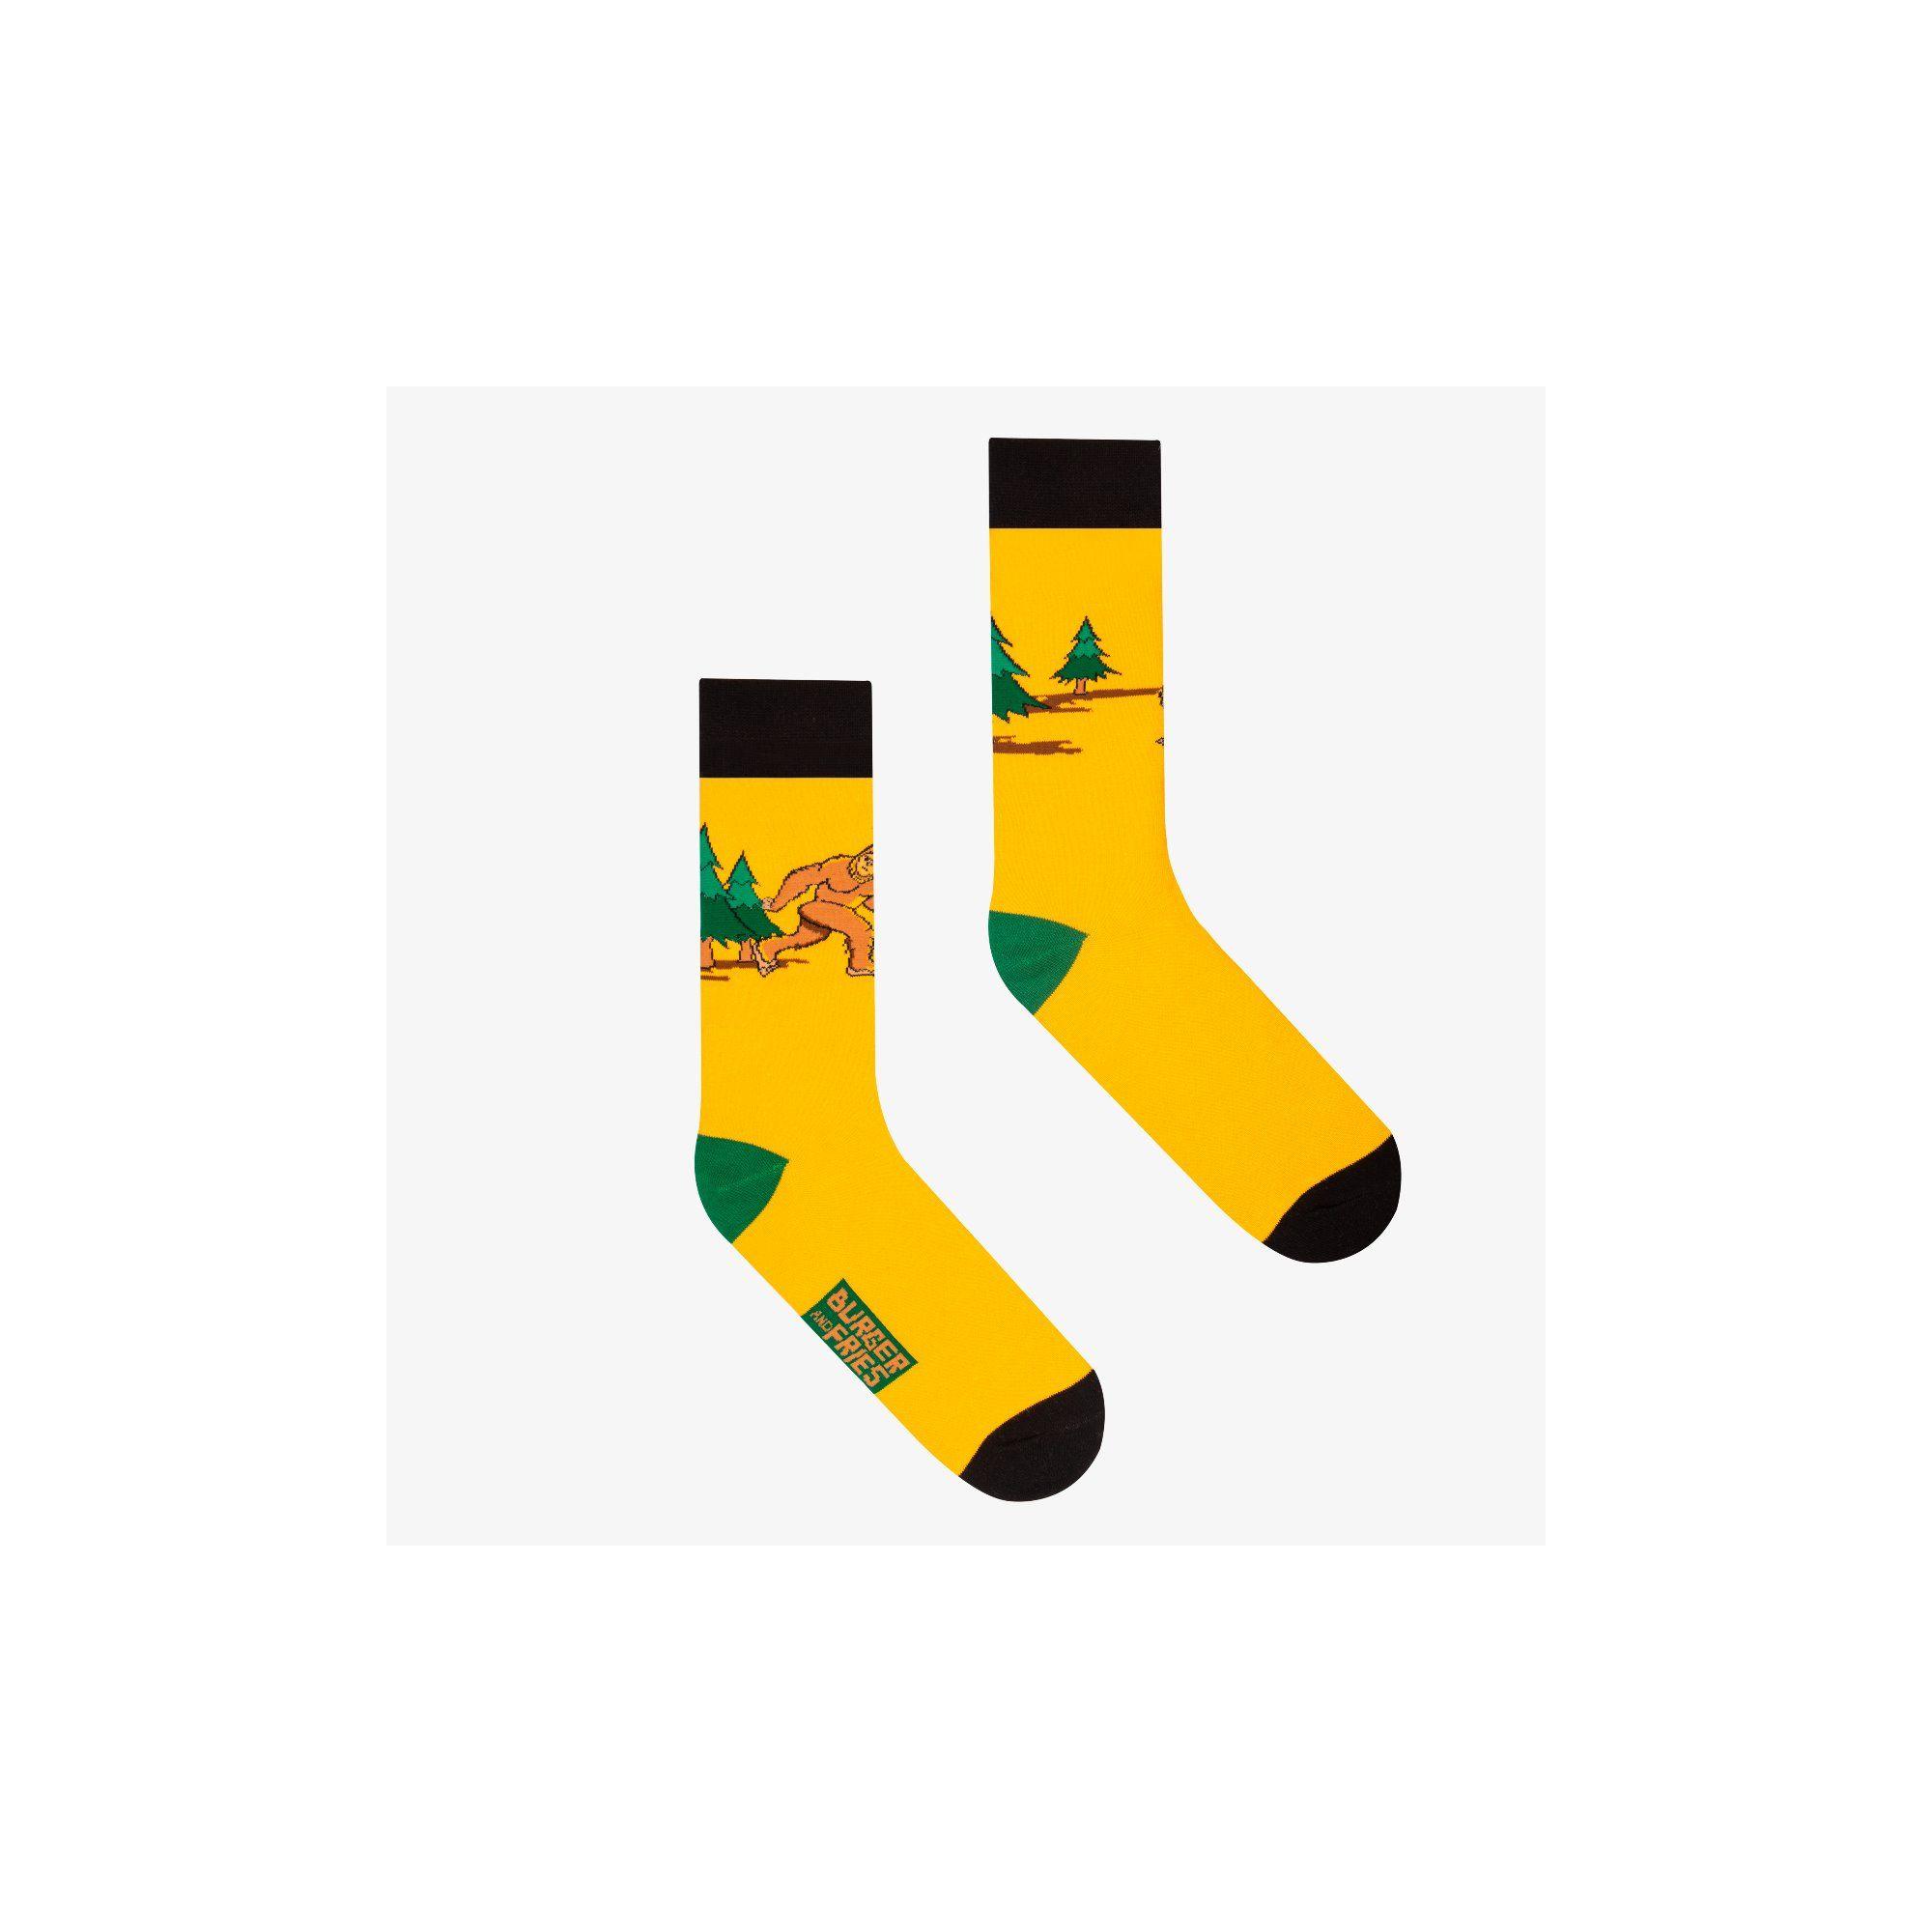 COUNTRY SOCKS AM I THE BIGFOOT